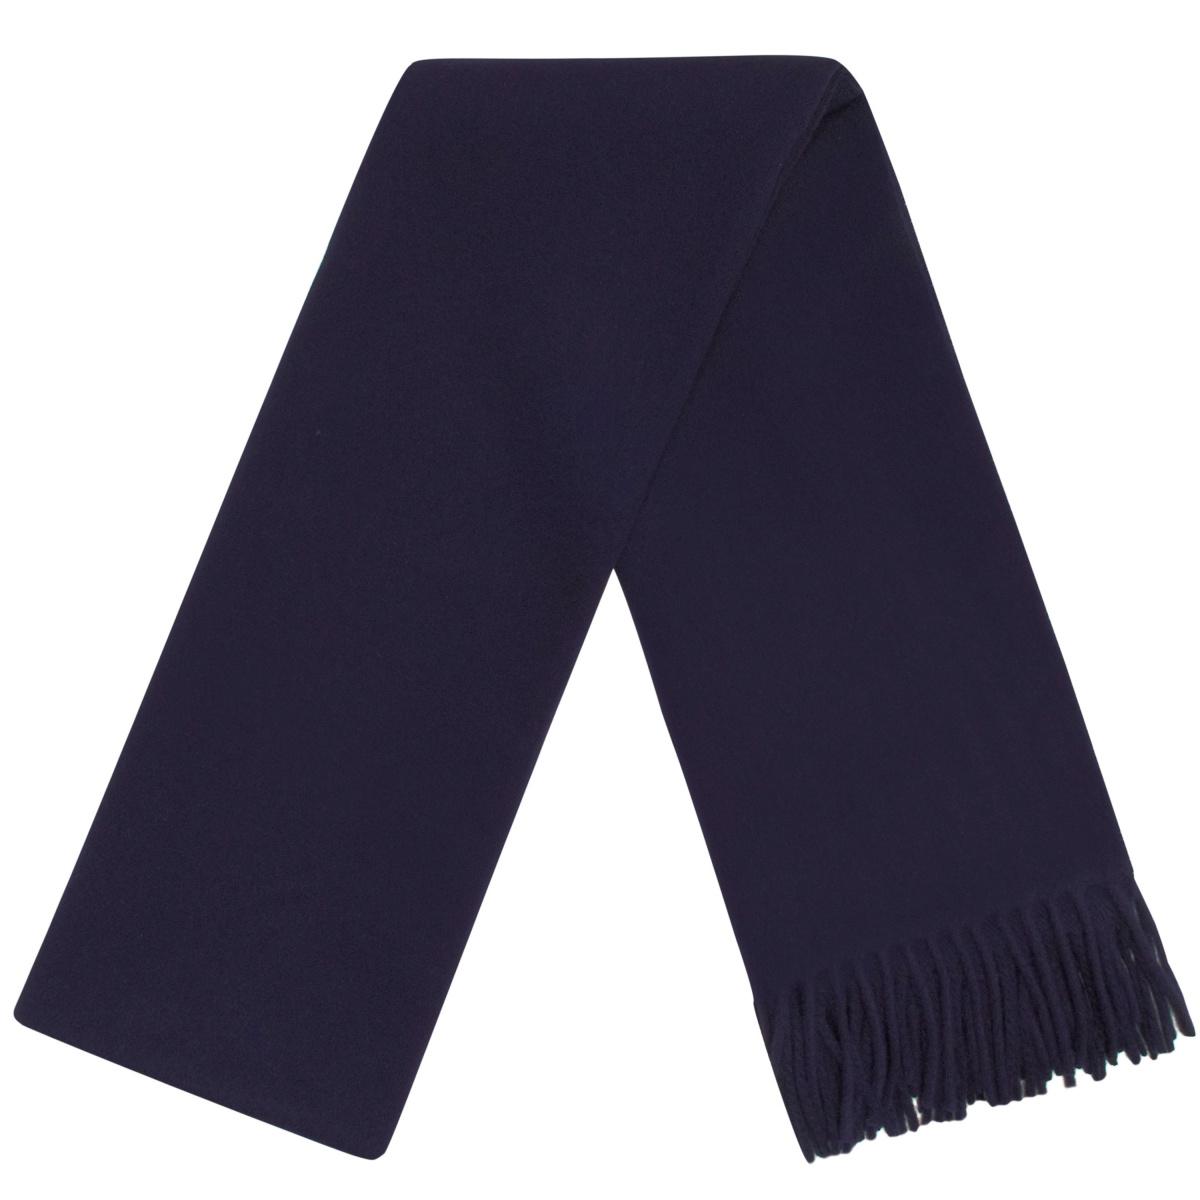 grande charpe bleu marine en pure laine vierge d 39 italie hast. Black Bedroom Furniture Sets. Home Design Ideas